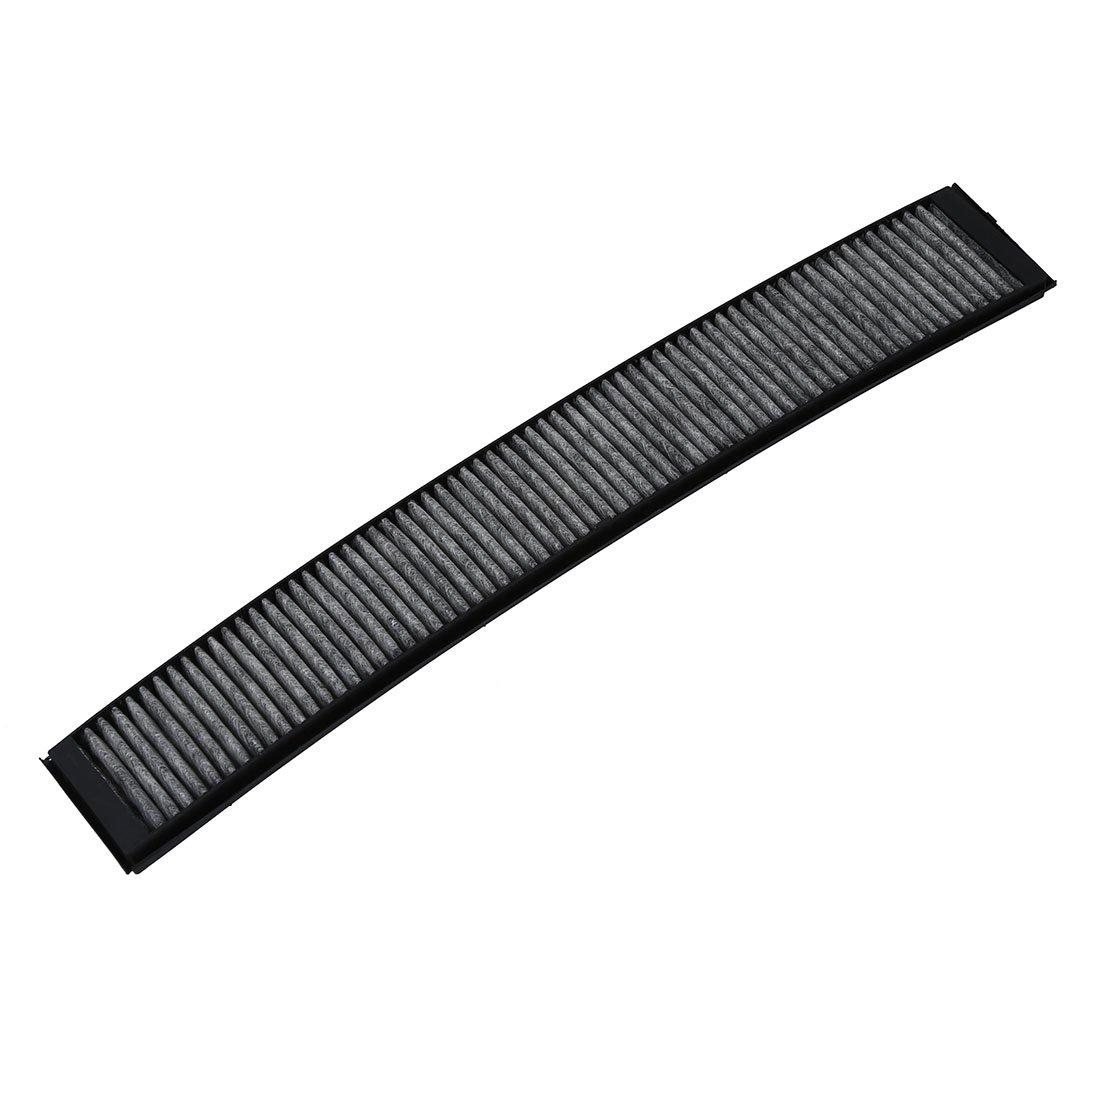 Air Filter - SODIAL(R) Cabin Air Filter 10-05 for BMW E46 X3 323i 323Ci 325Xi 325i 328i 330Ci 330Xi M3